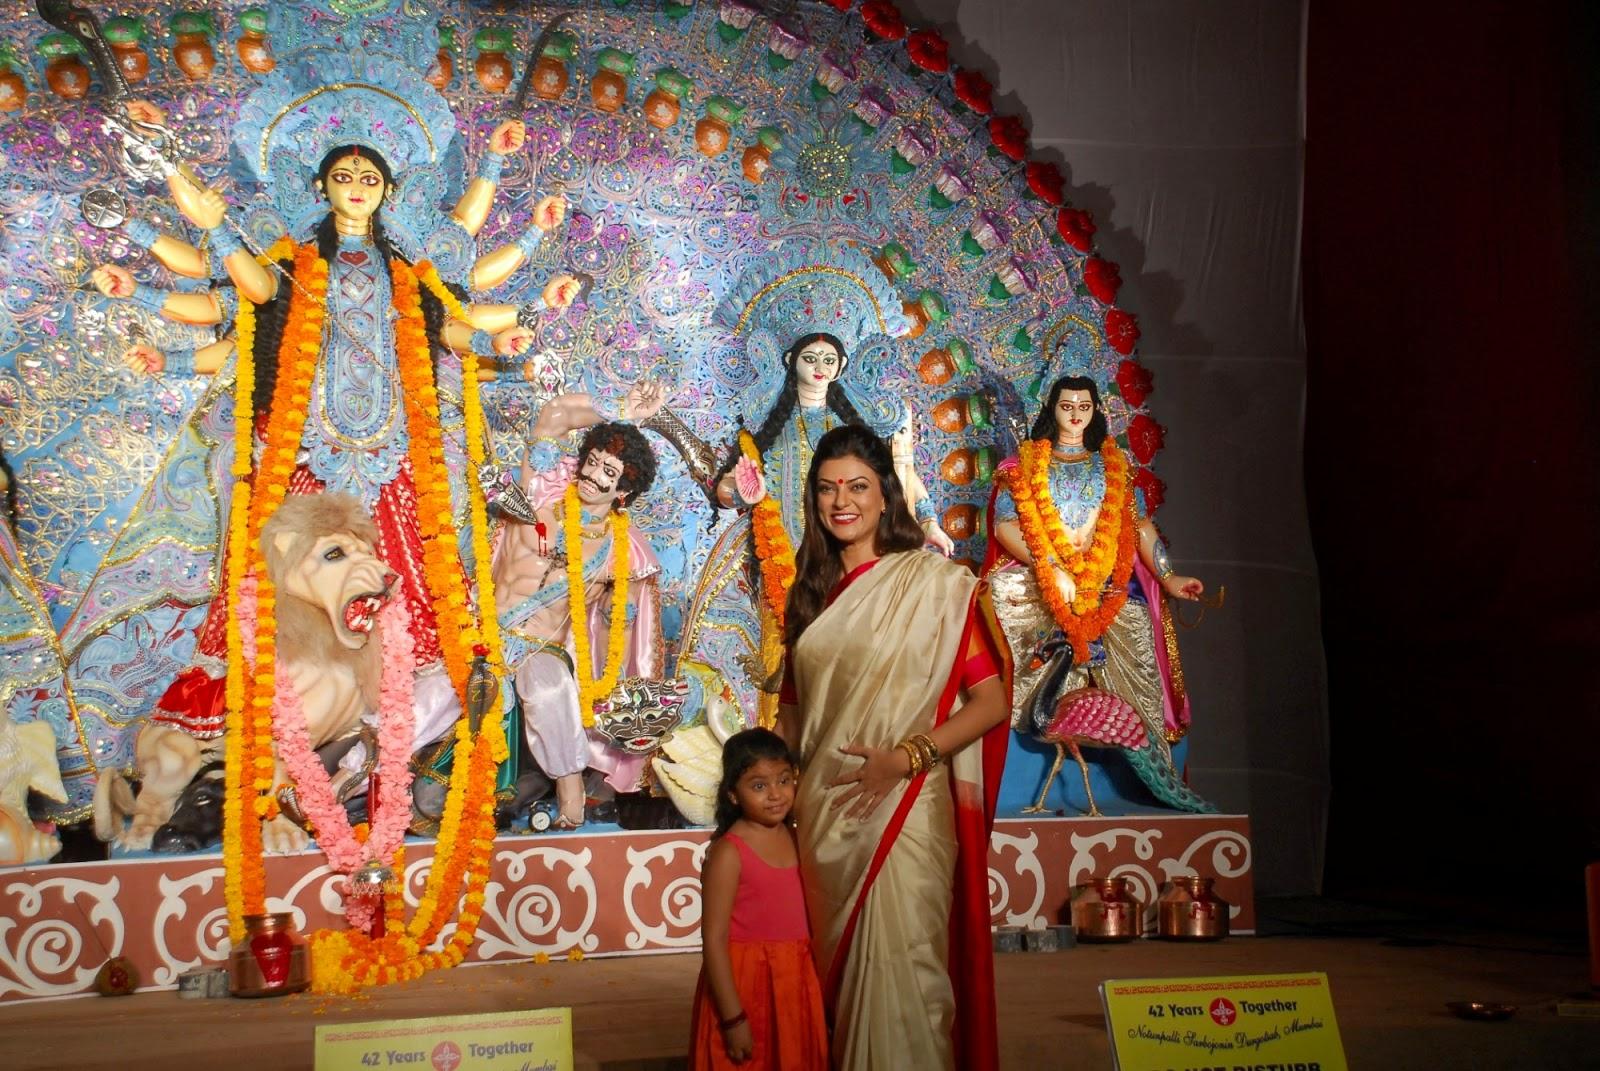 Sushmita Sen visits North Bombay Sarbojanin Durga Puja Pandal